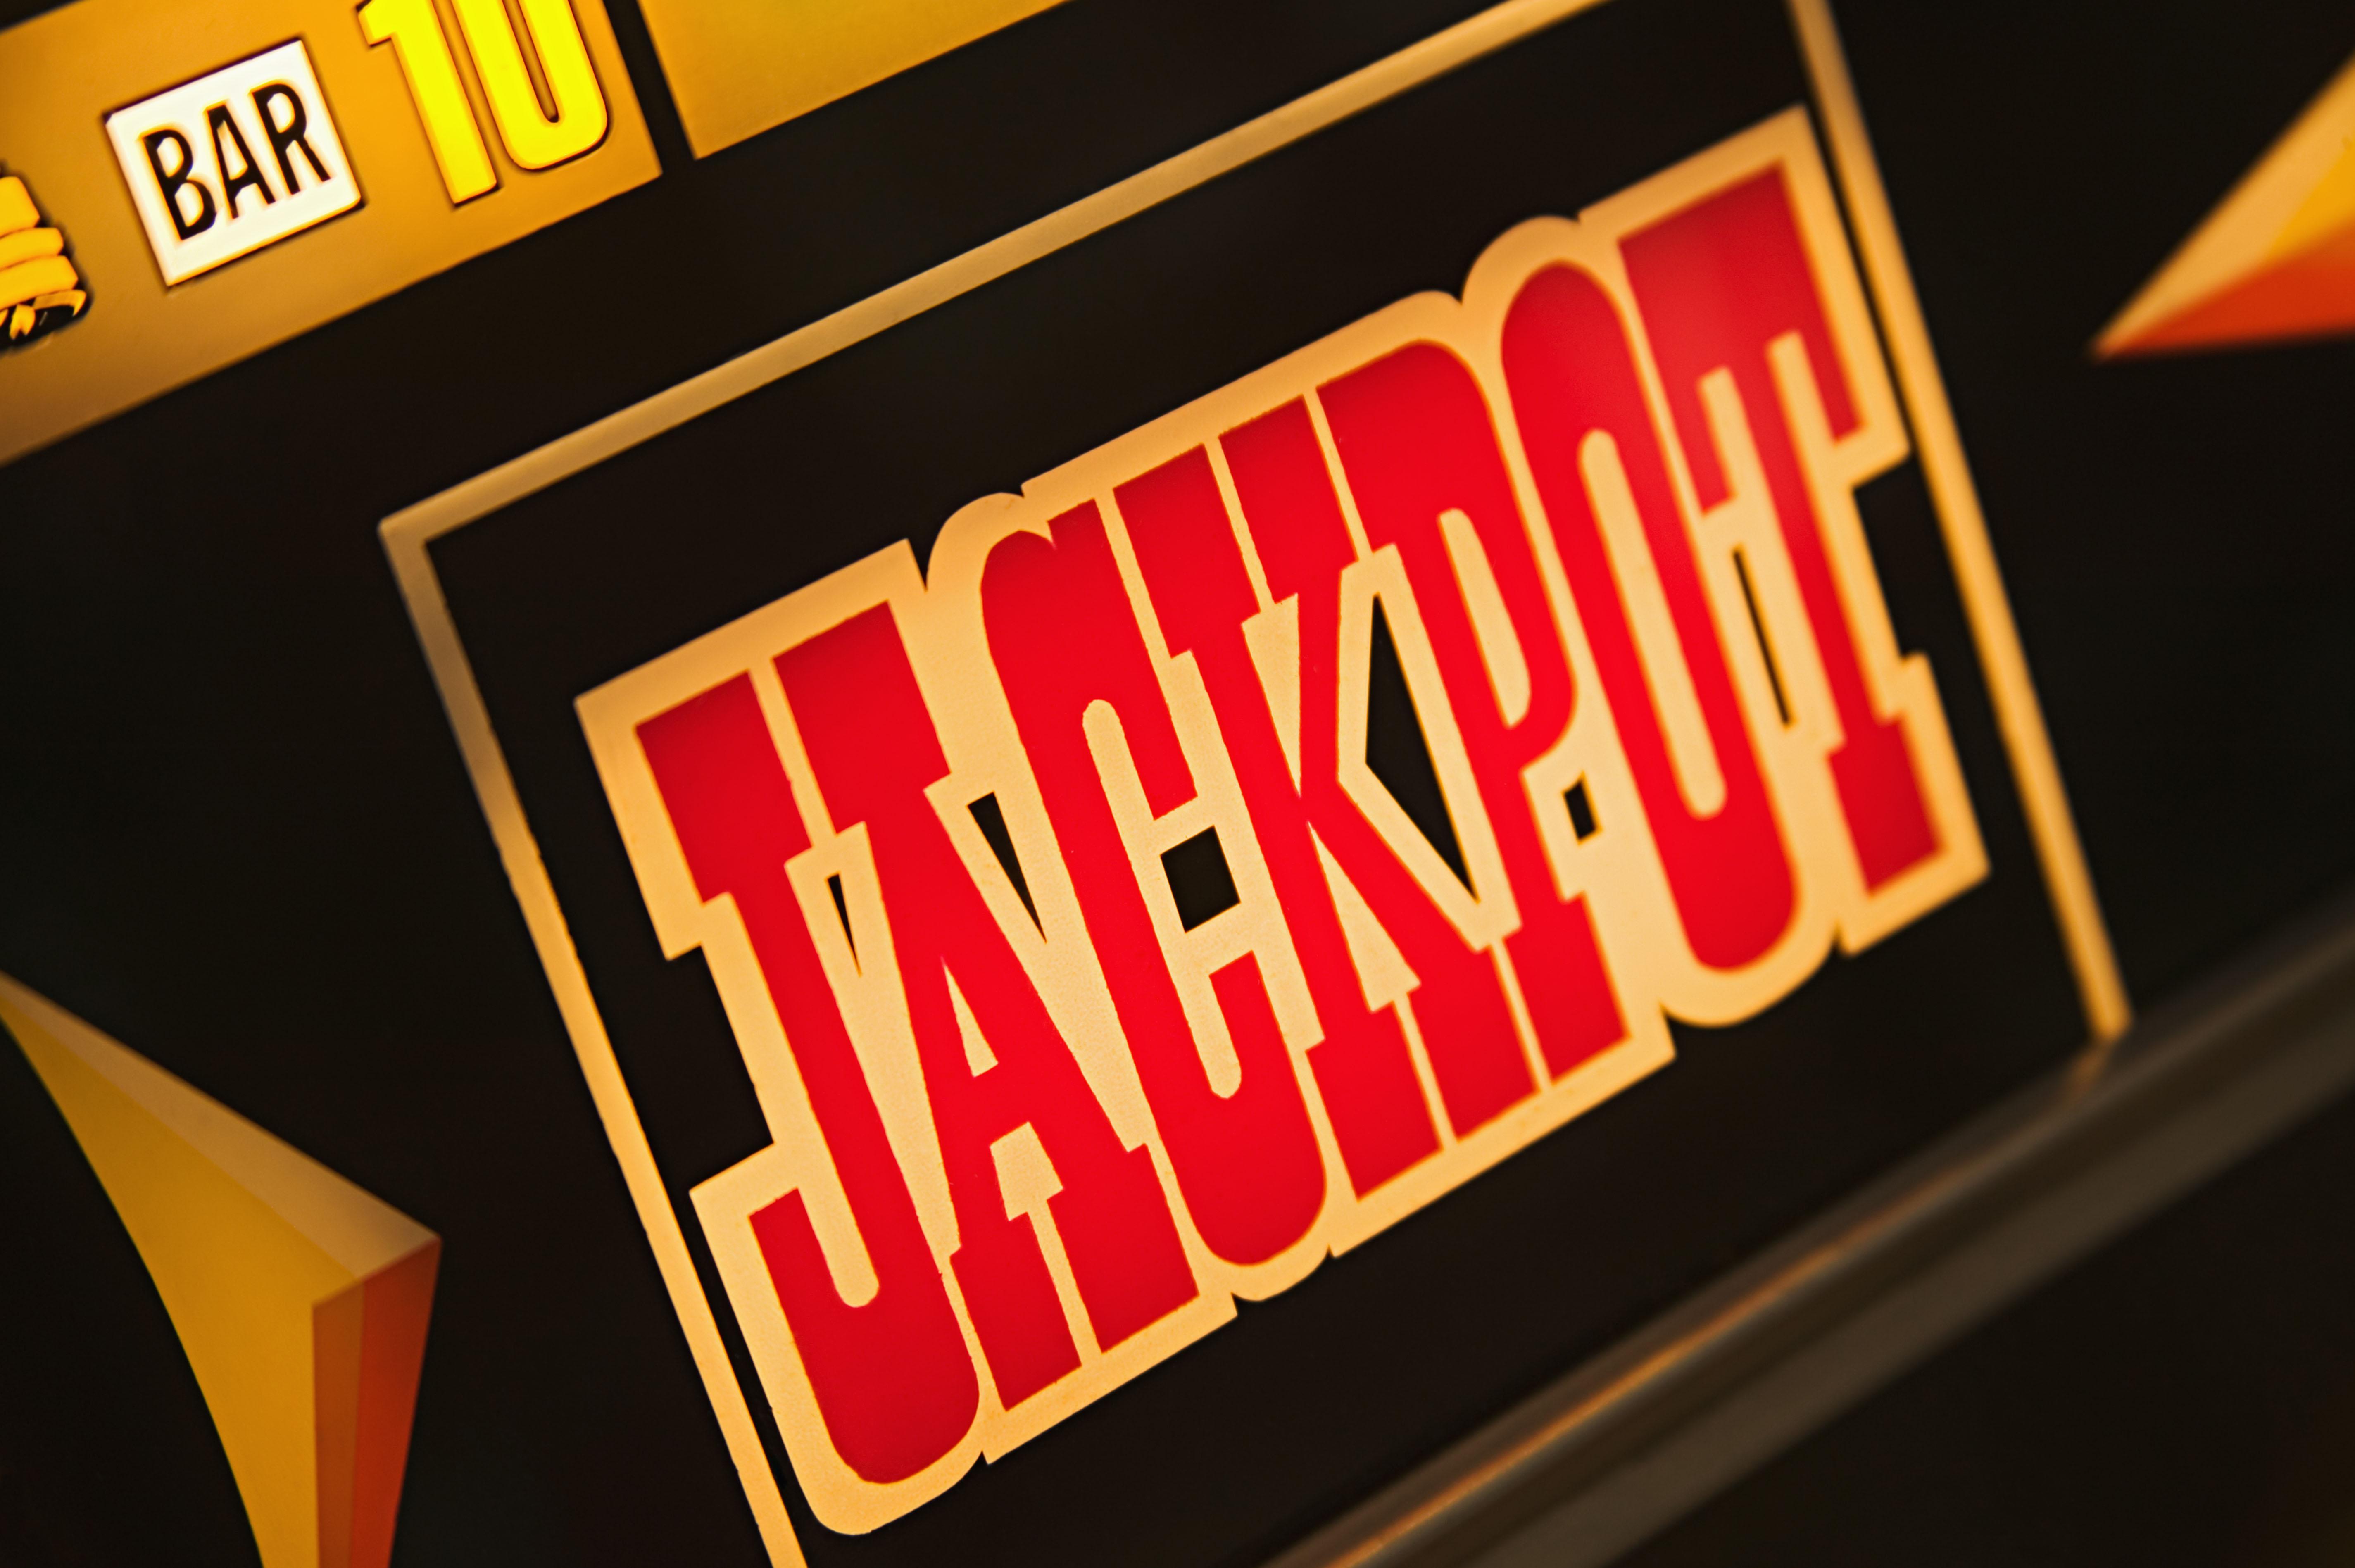 Игрок William Hill выиграл 1 000 000$ джекпот на слотах